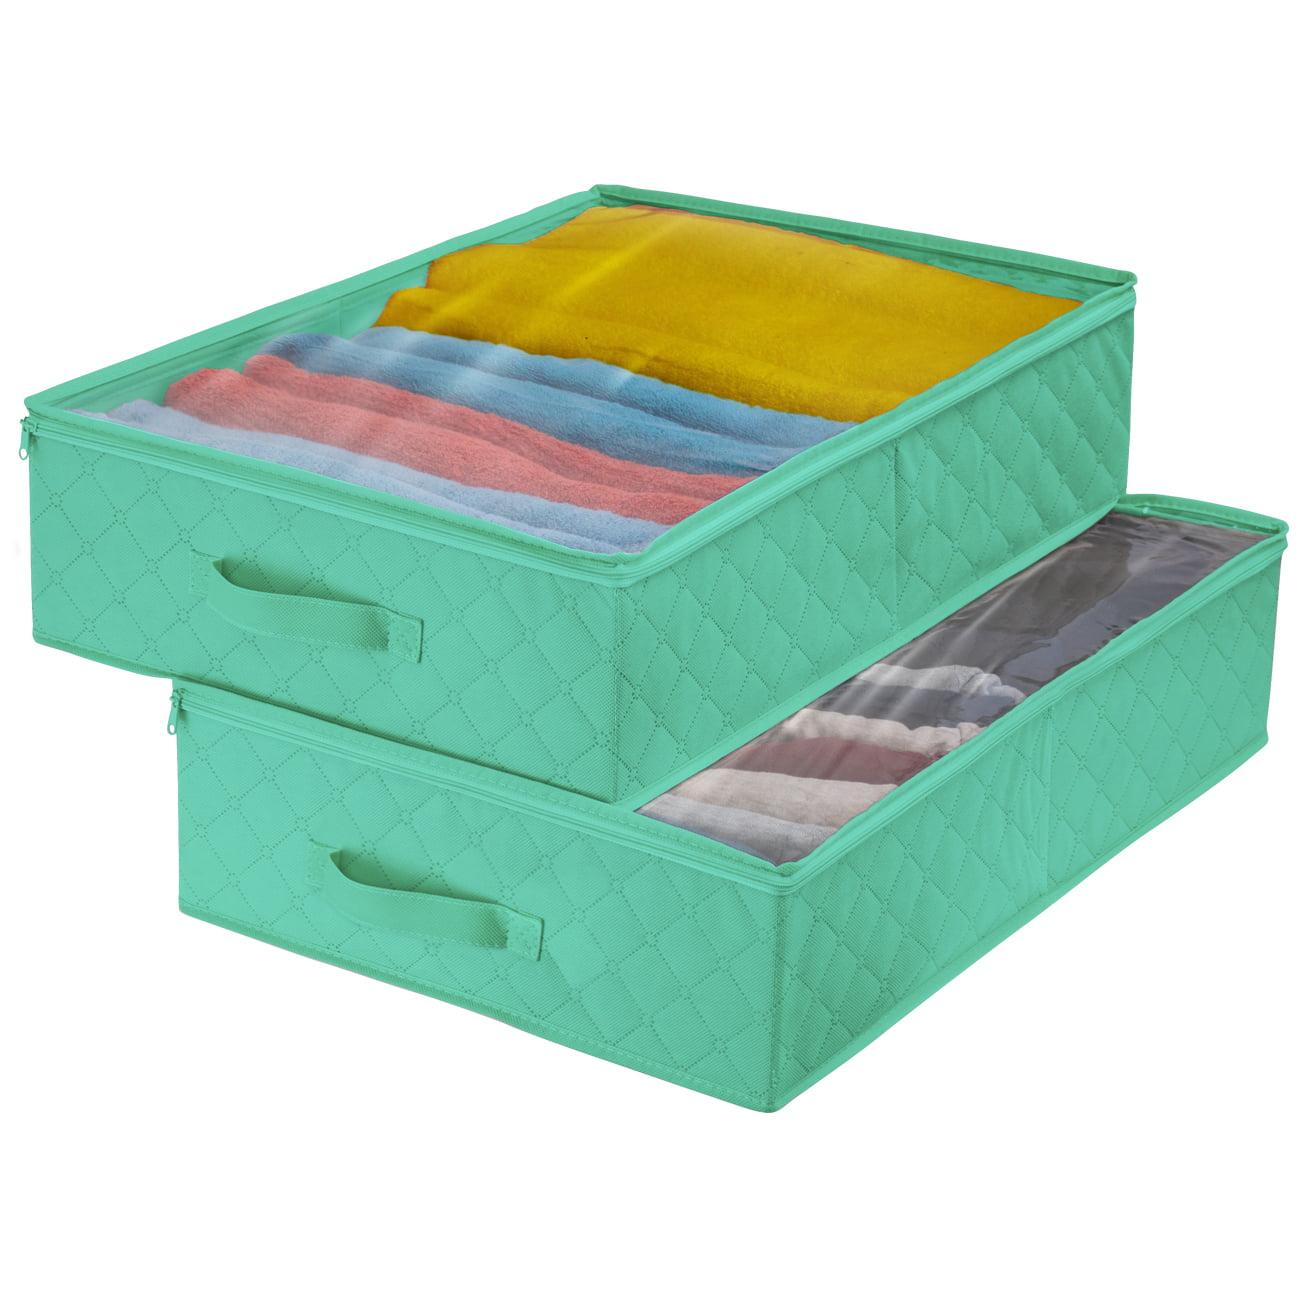 Storage Closet Organizer - Teal, (2 Pack)